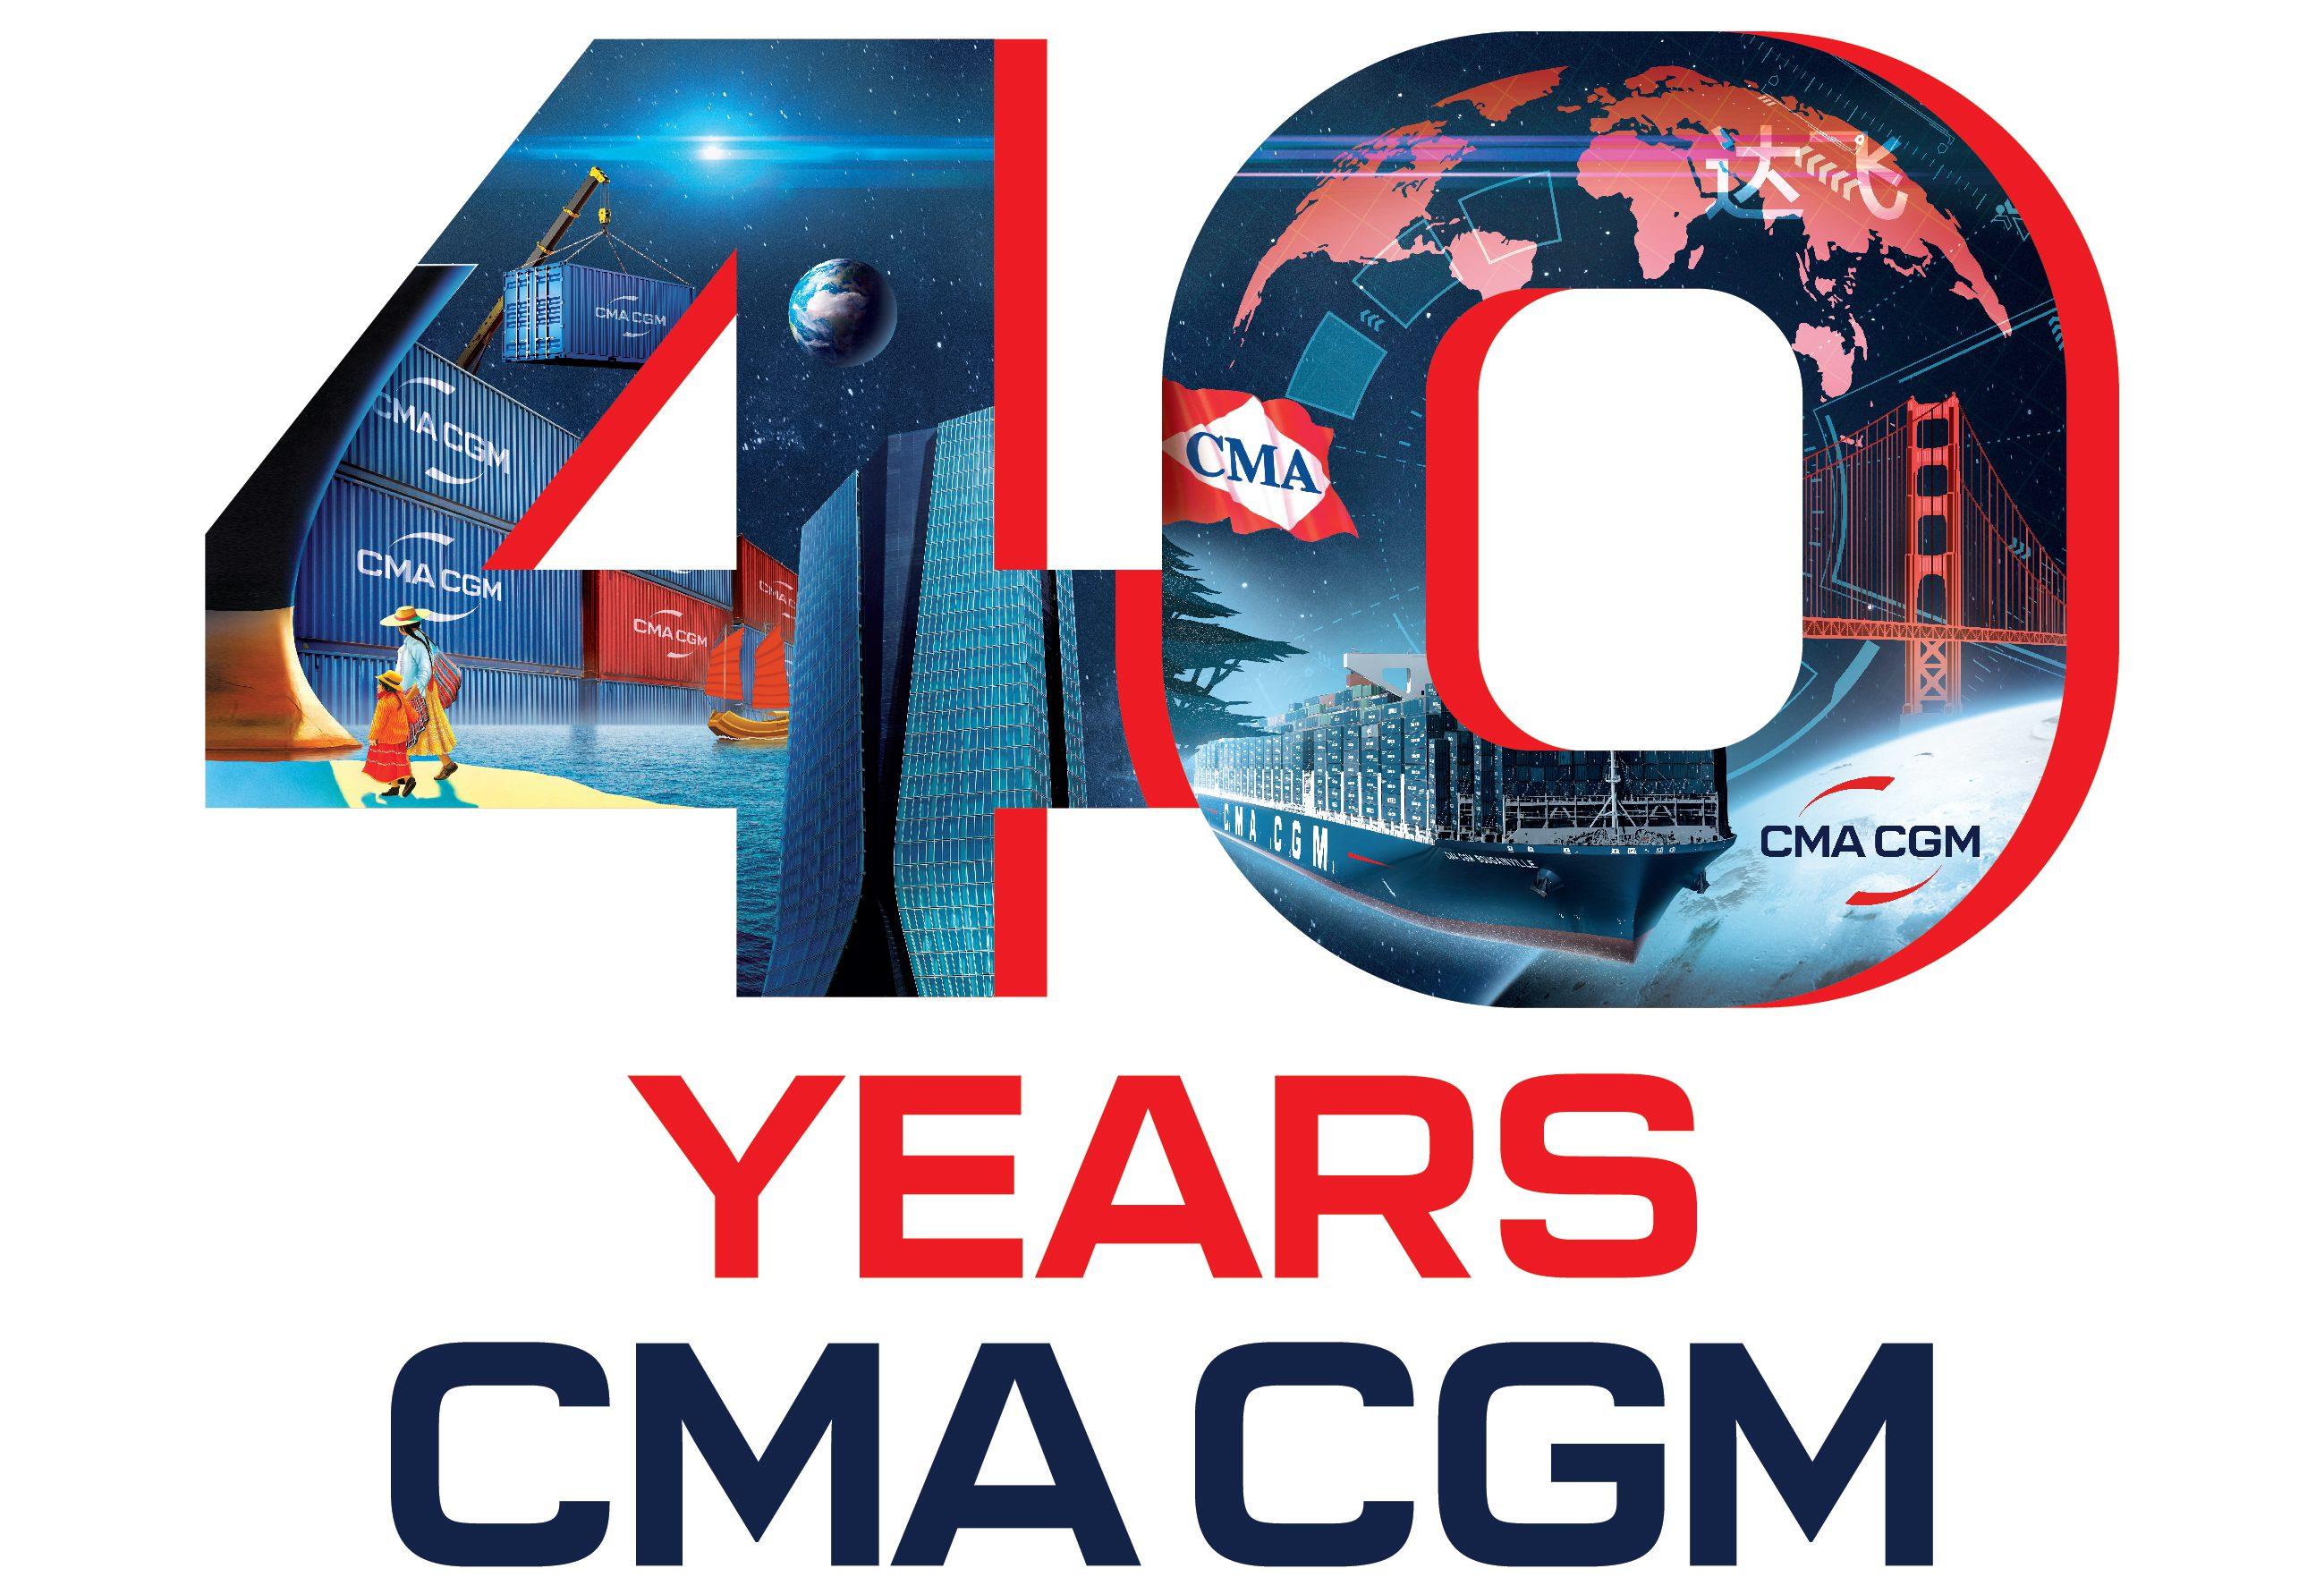 Inauguration du CMA CGM Antoine de Saint Exupery